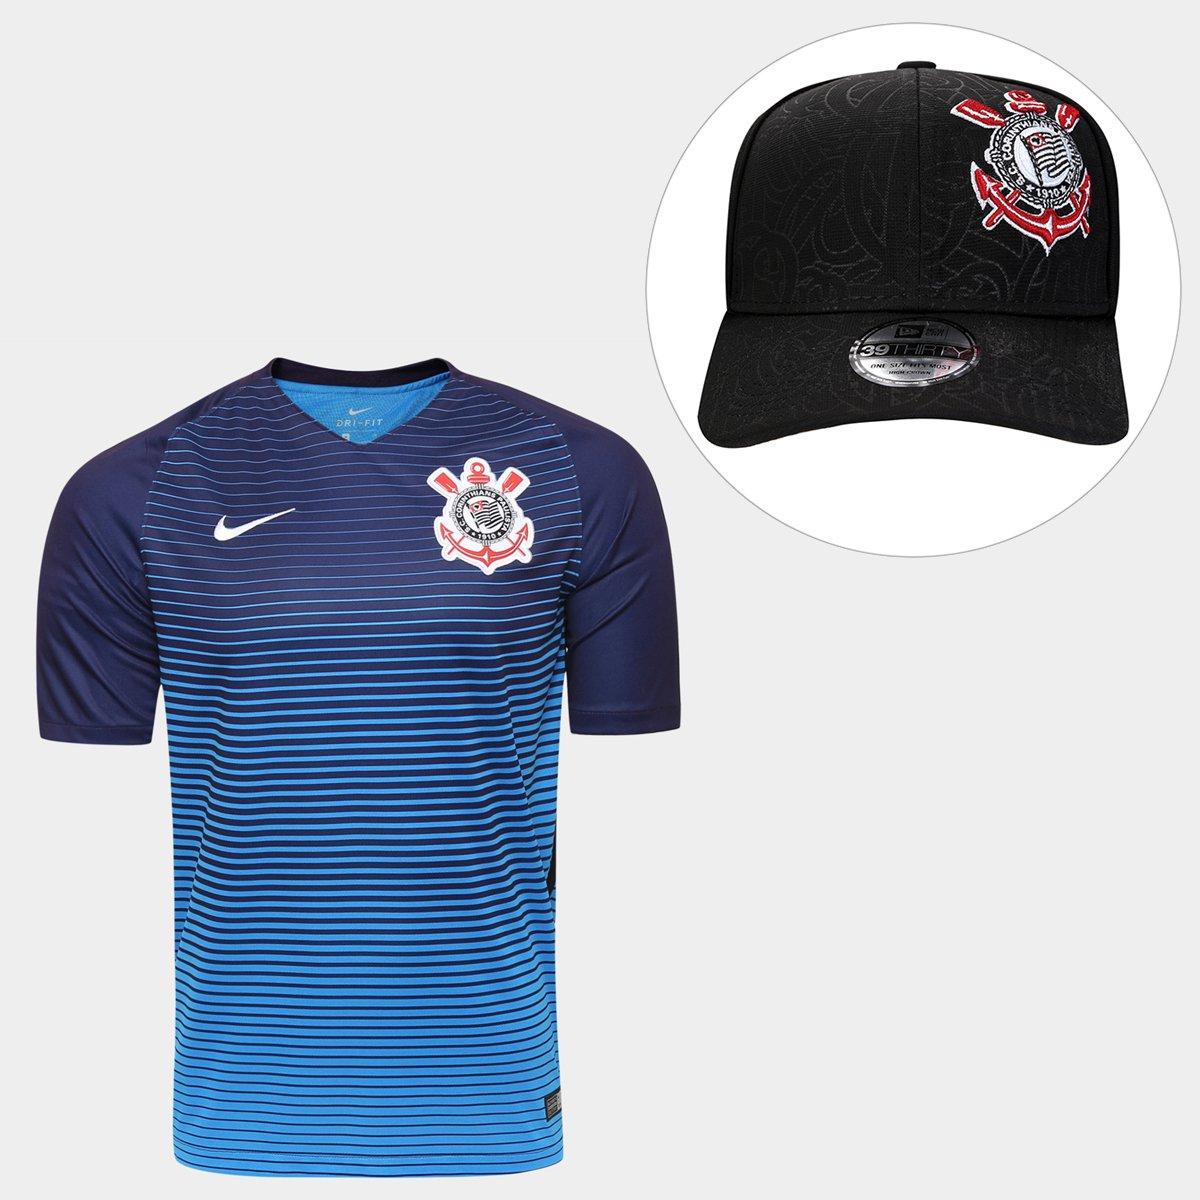 Kit Camisa Nike Corinthians III 2016 s nº - Torcedor + Boné New Era  Corinthians 3930 - Compre Agora  5c2ffefbae30a